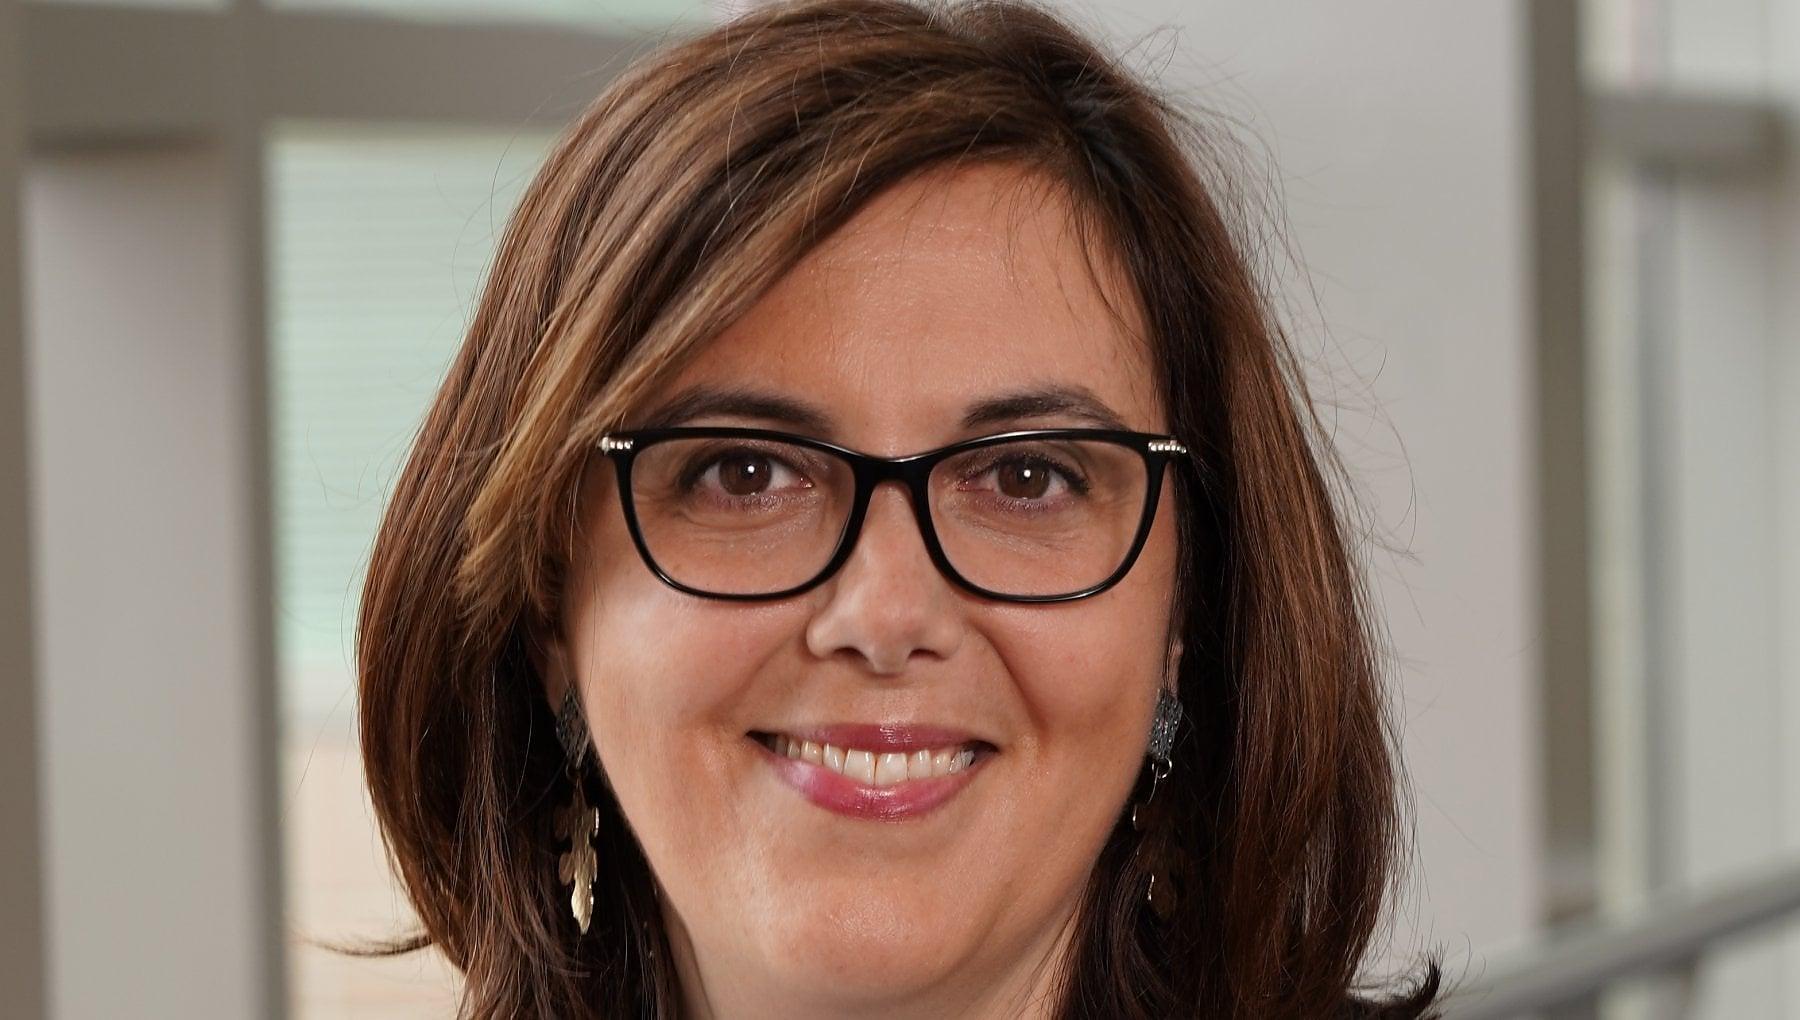 La scienziata Valeria De Giorgi: